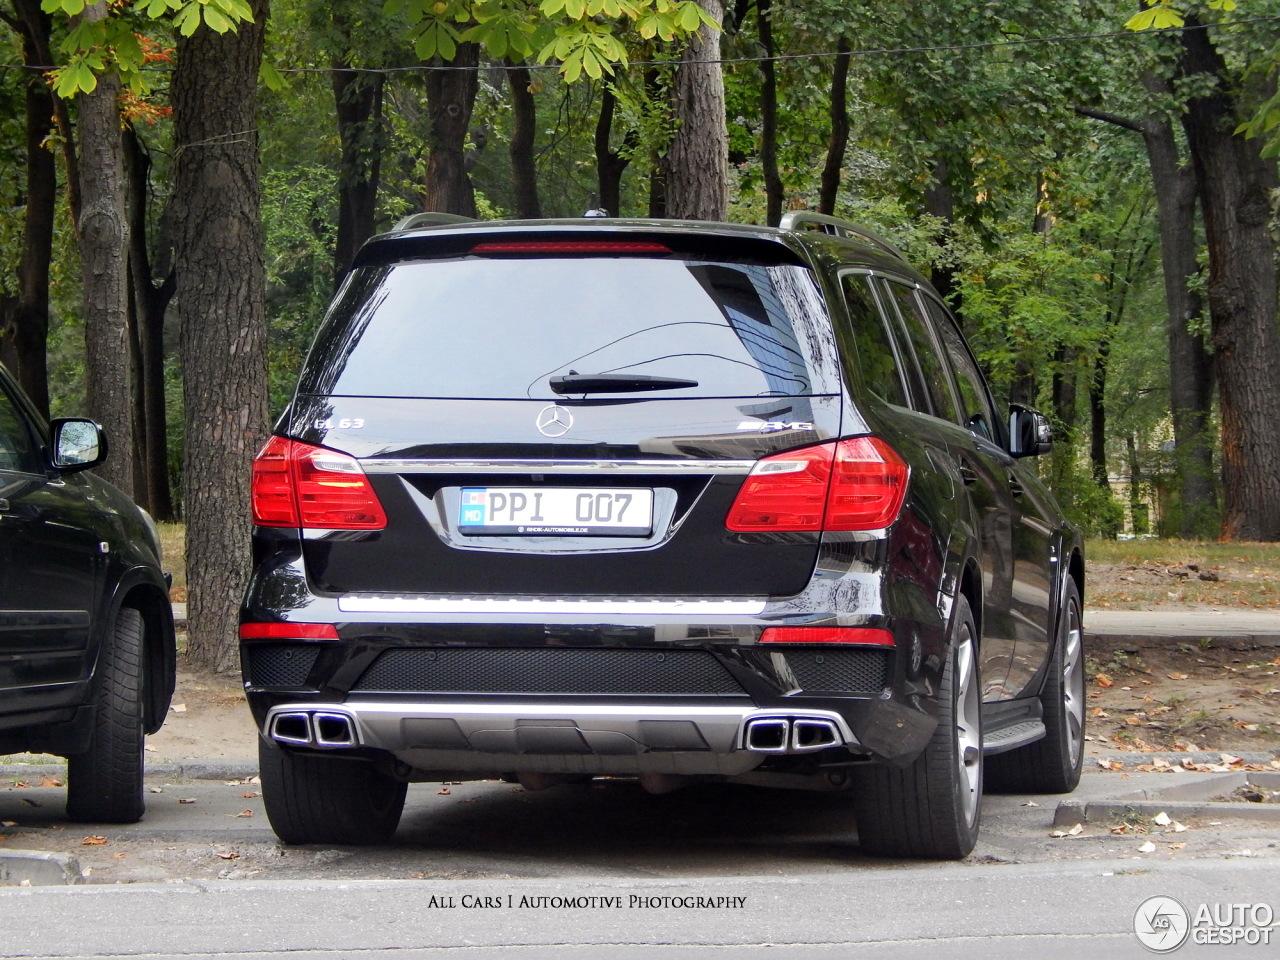 Mercedes benz gl 63 amg x166 27 october 2015 autogespot for Mercedes benz gl amg 2015